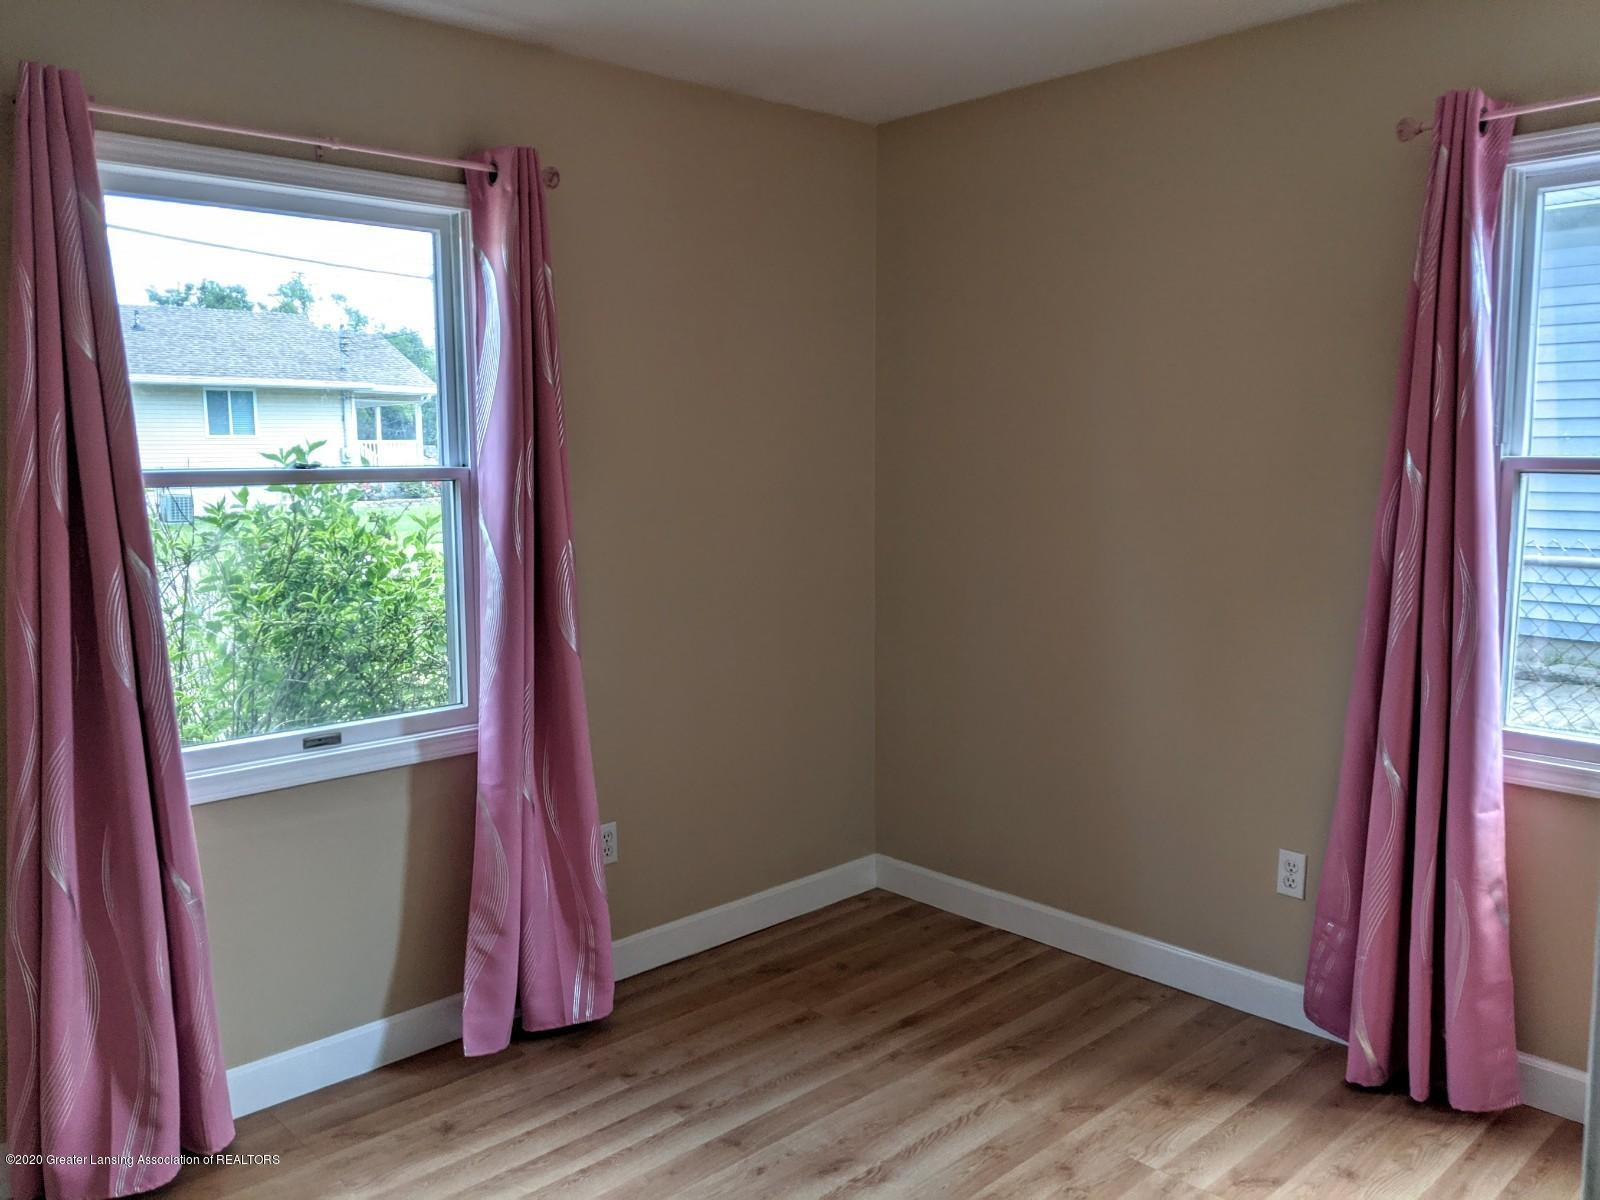 5030 Tenny St - Bedroom 2 - 13